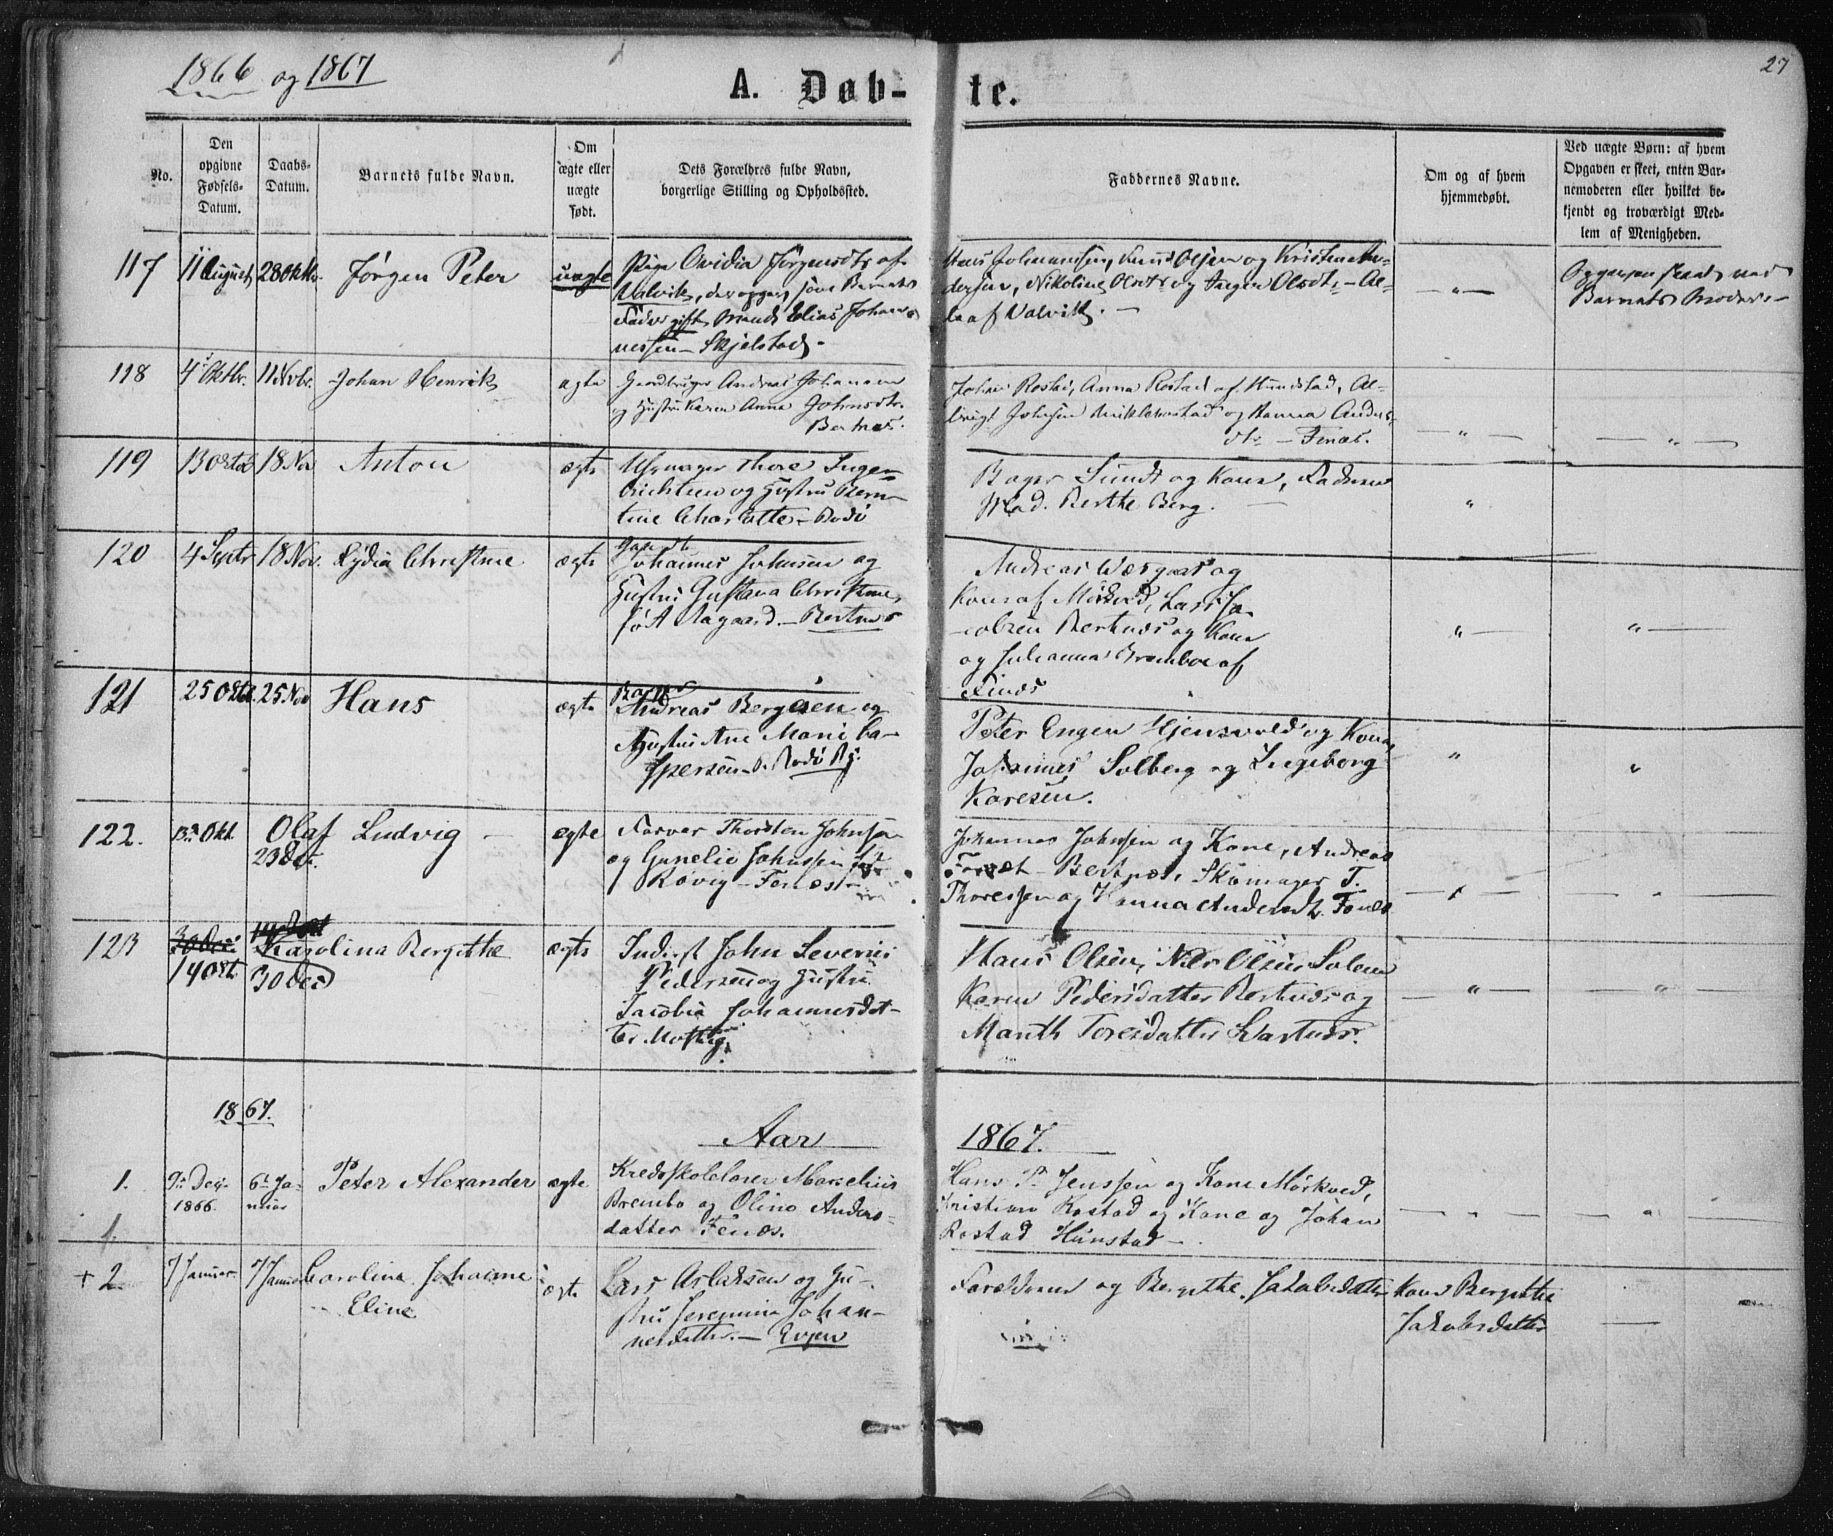 SAT, Ministerialprotokoller, klokkerbøker og fødselsregistre - Nordland, 801/L0008: Ministerialbok nr. 801A08, 1864-1875, s. 27